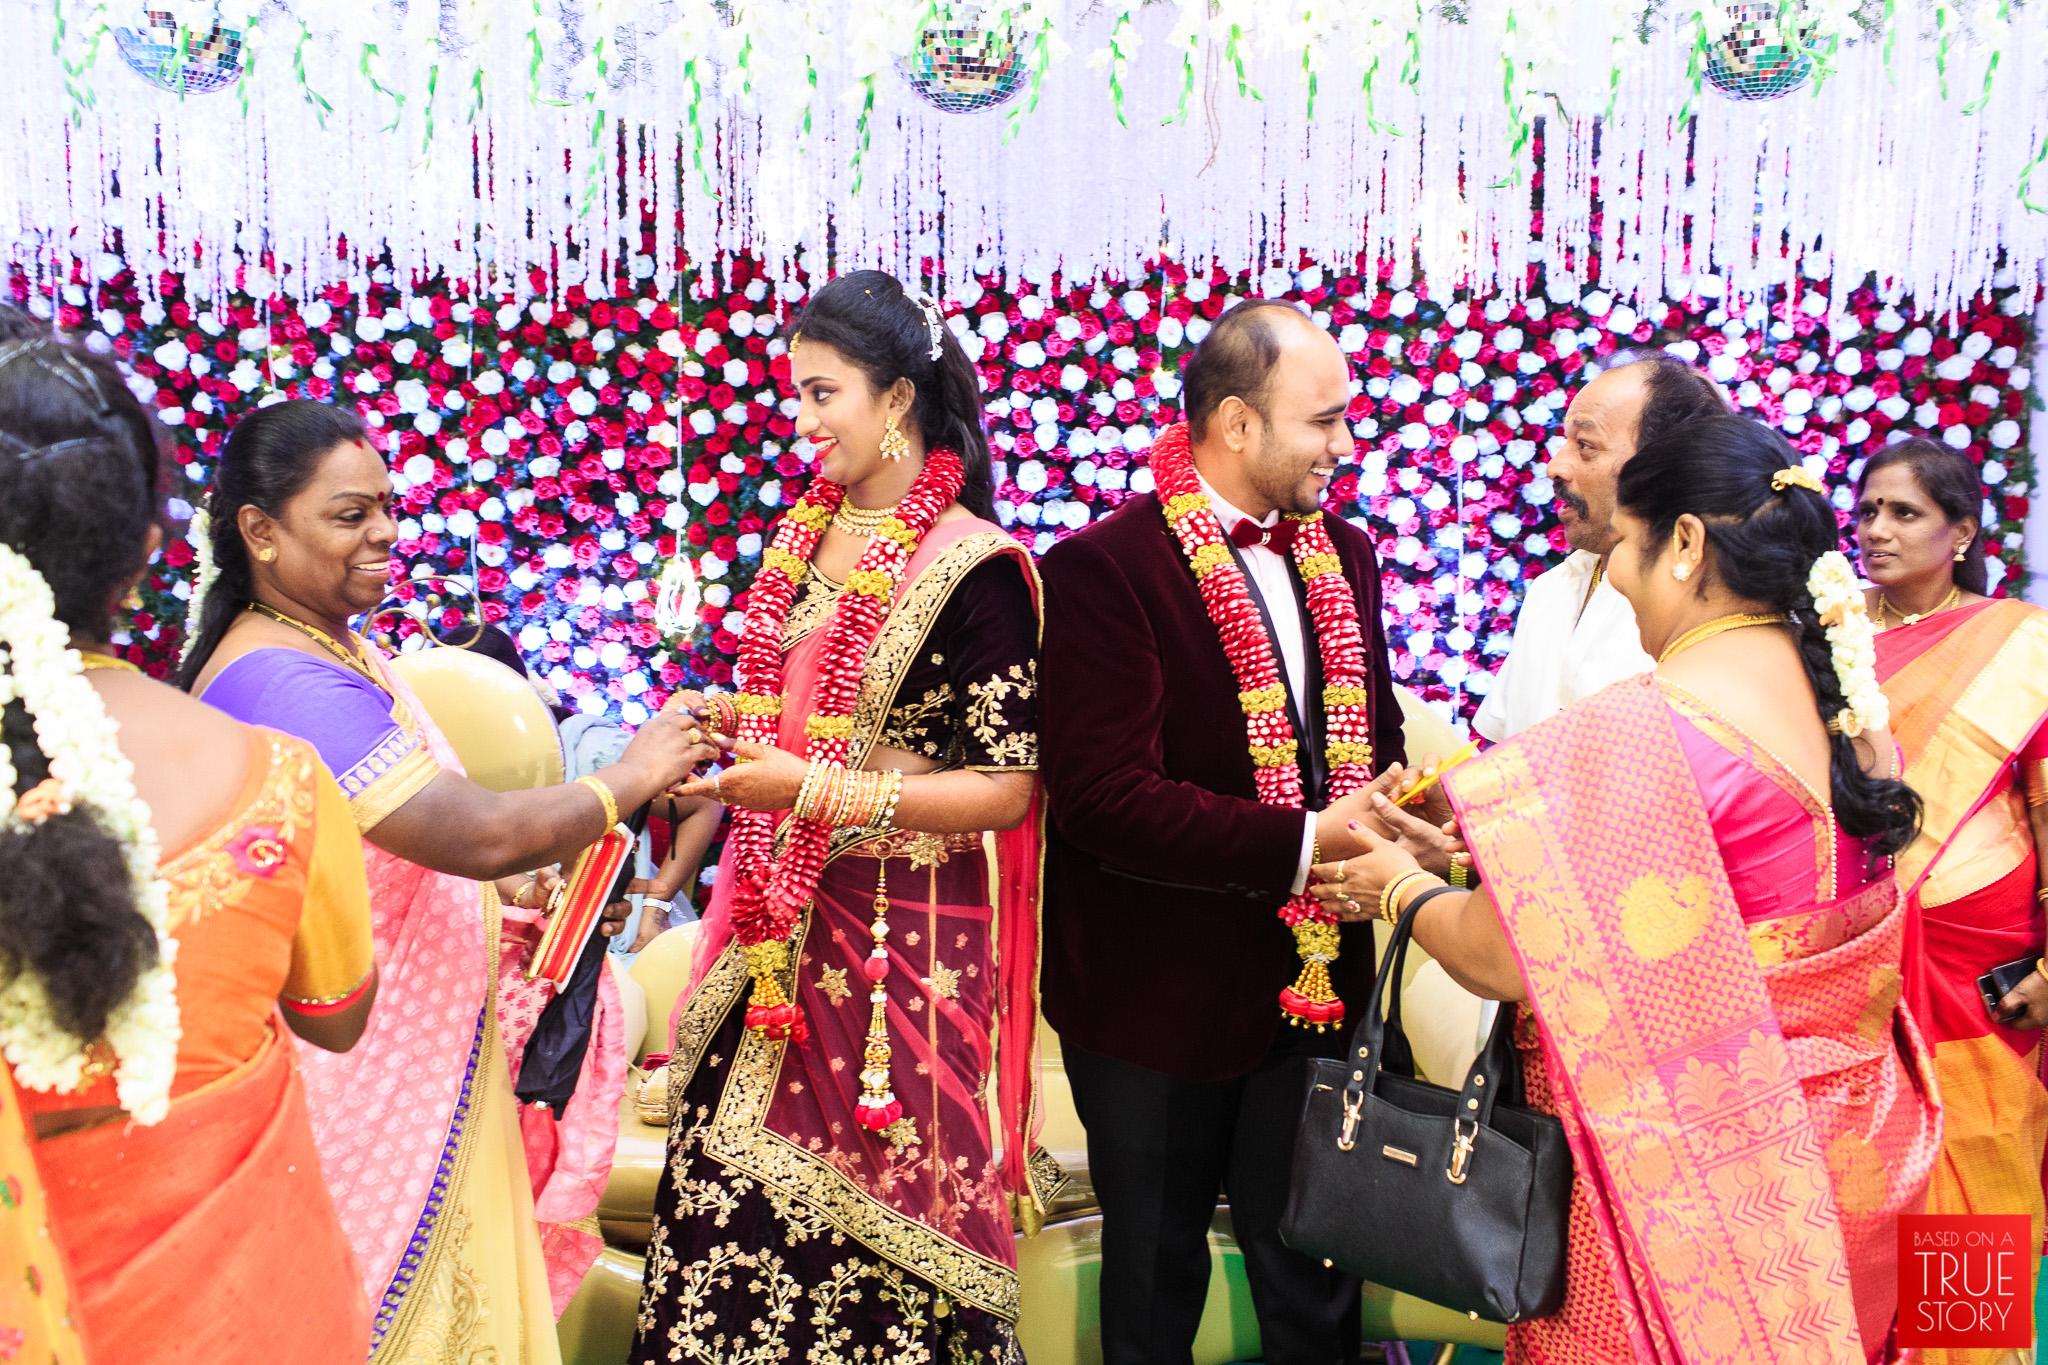 Tamil-Candid-Wedding-Photography-0025.jpg